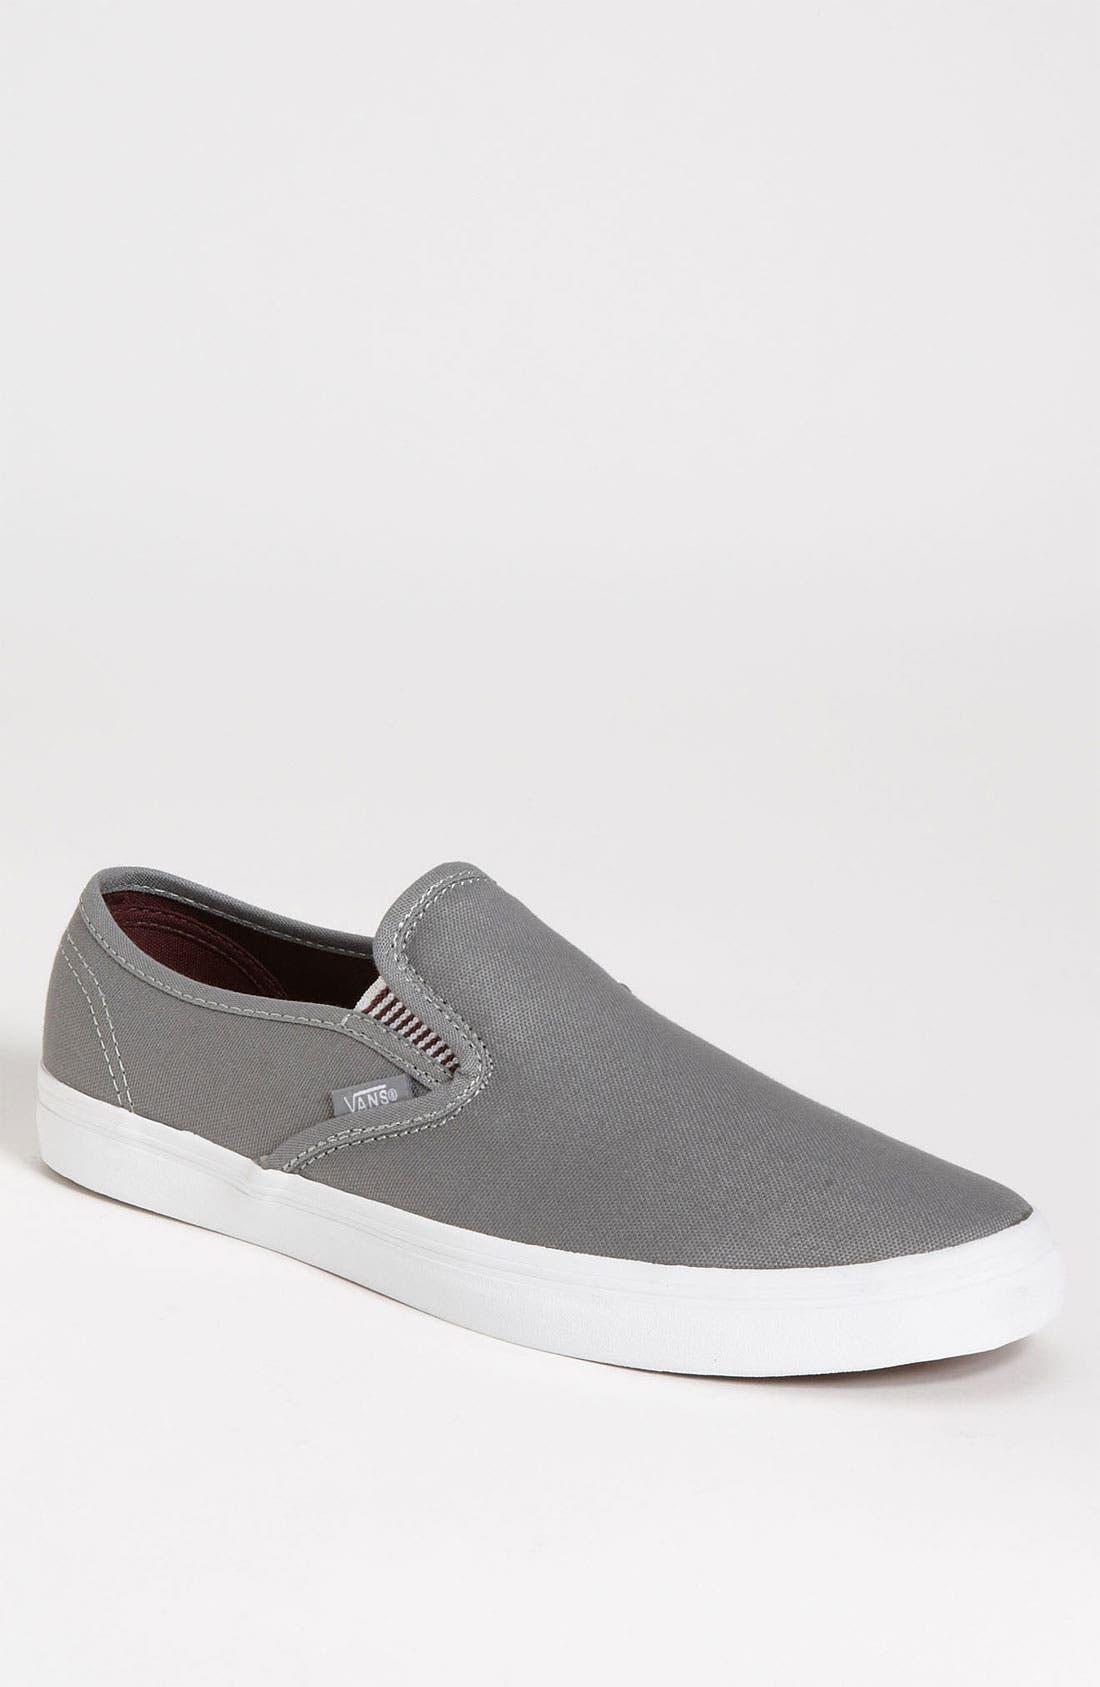 Main Image - Vans 'LP' Slip-On Sneaker (Men)